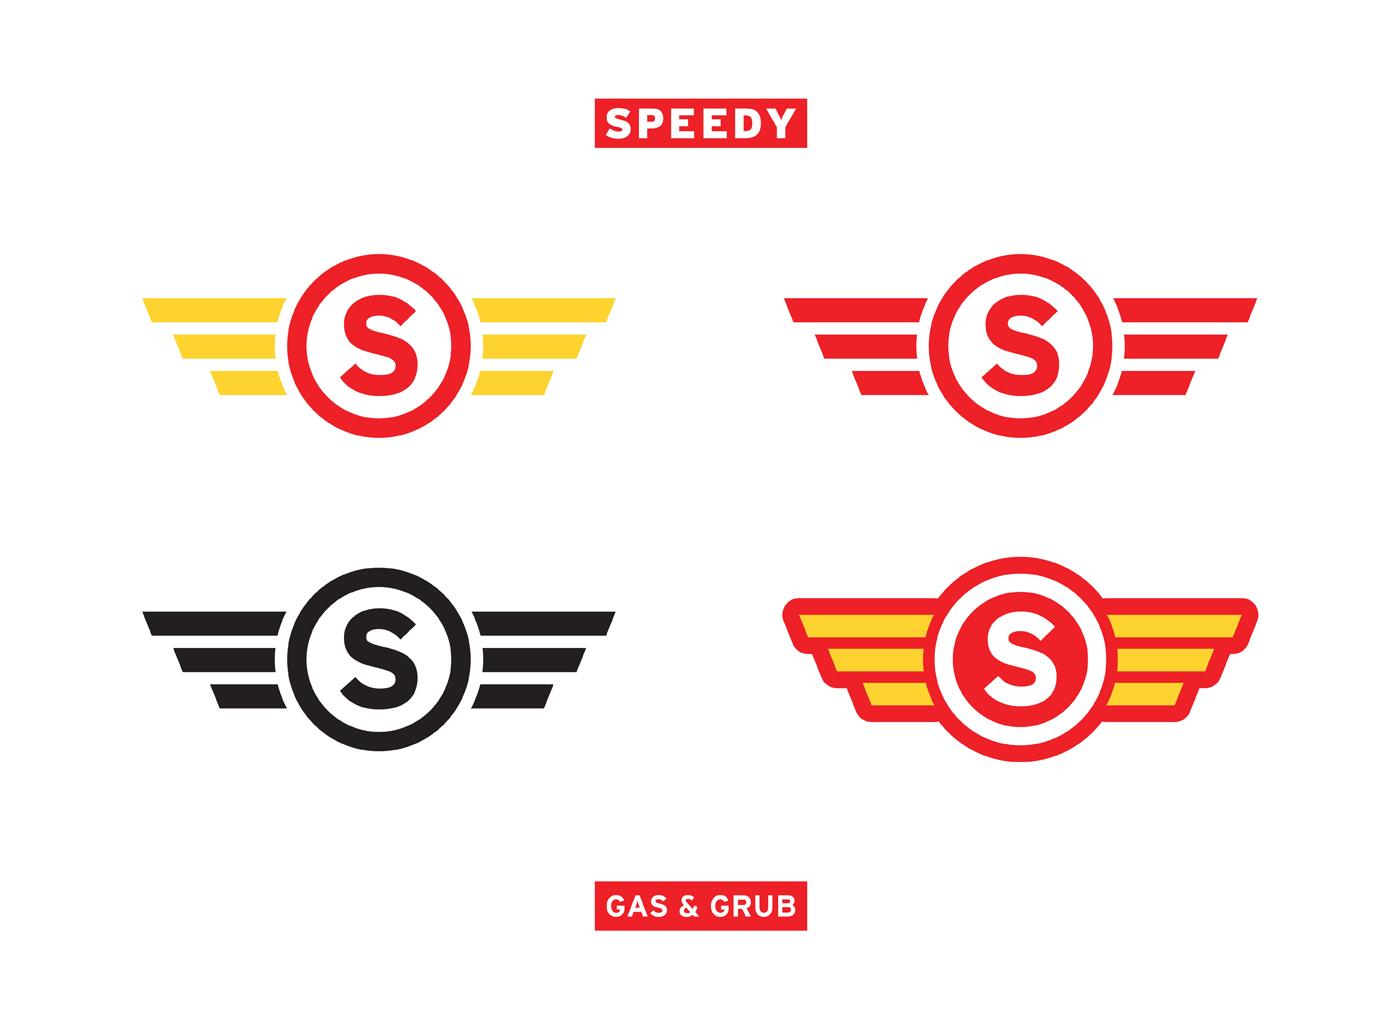 Speedy Gas Graphic Design Branding Secondary Logos